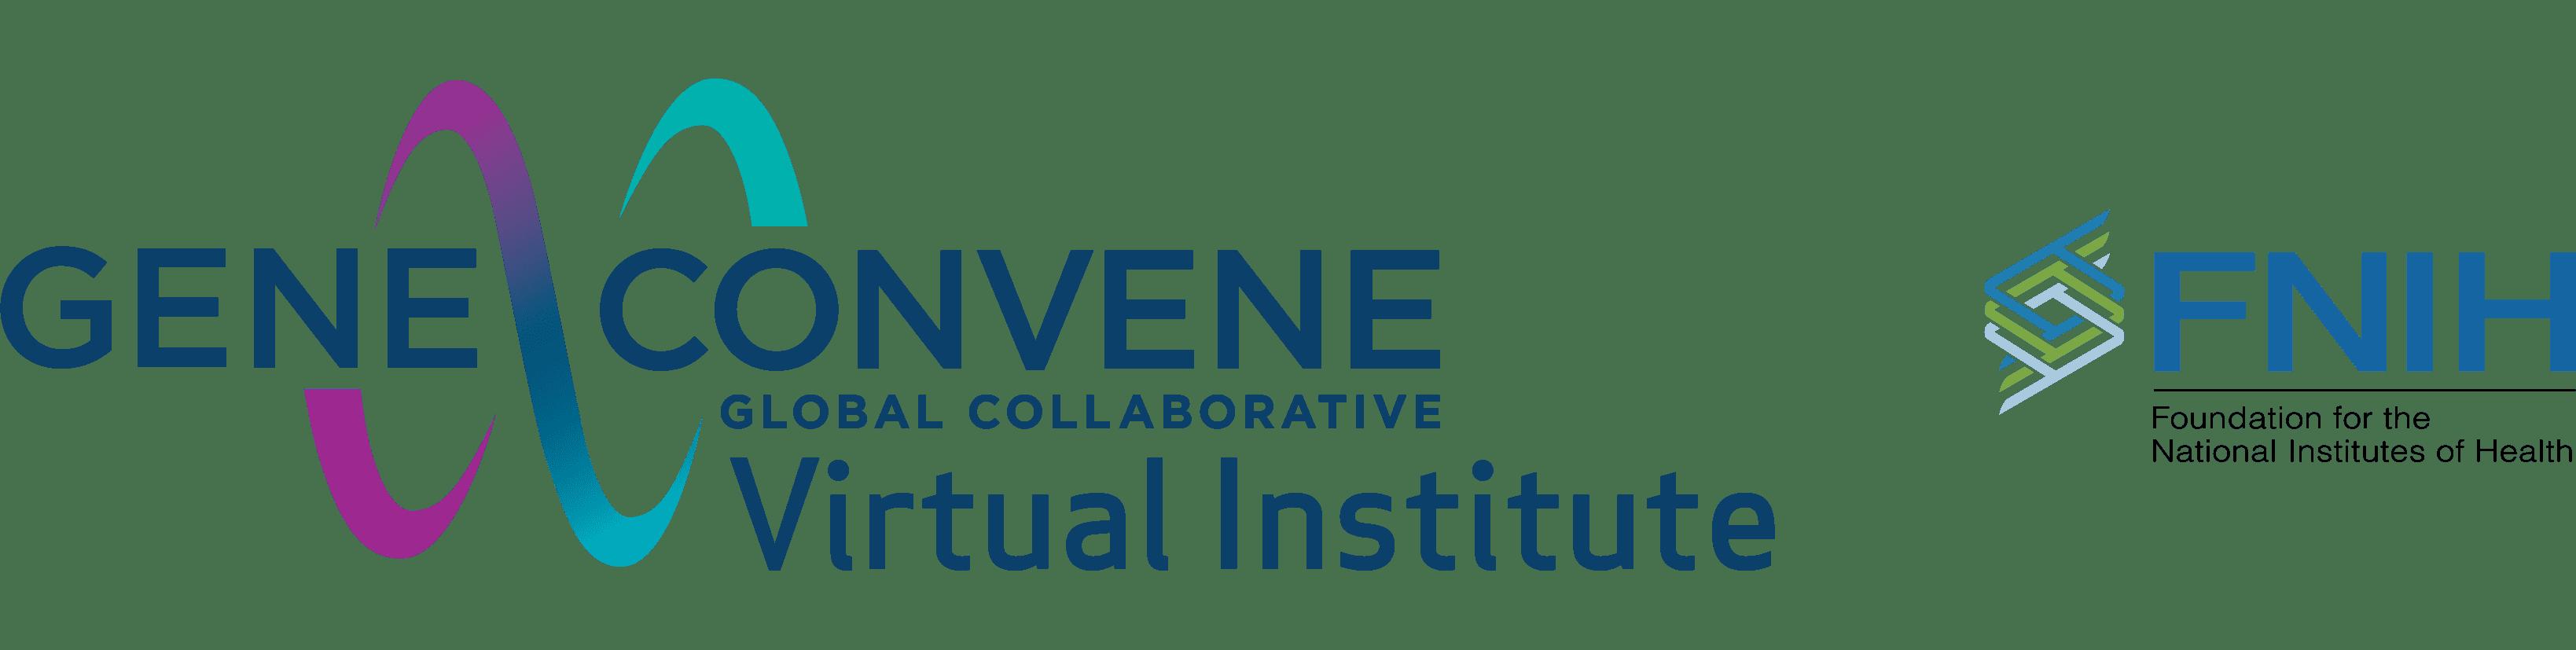 Gene Convene VI